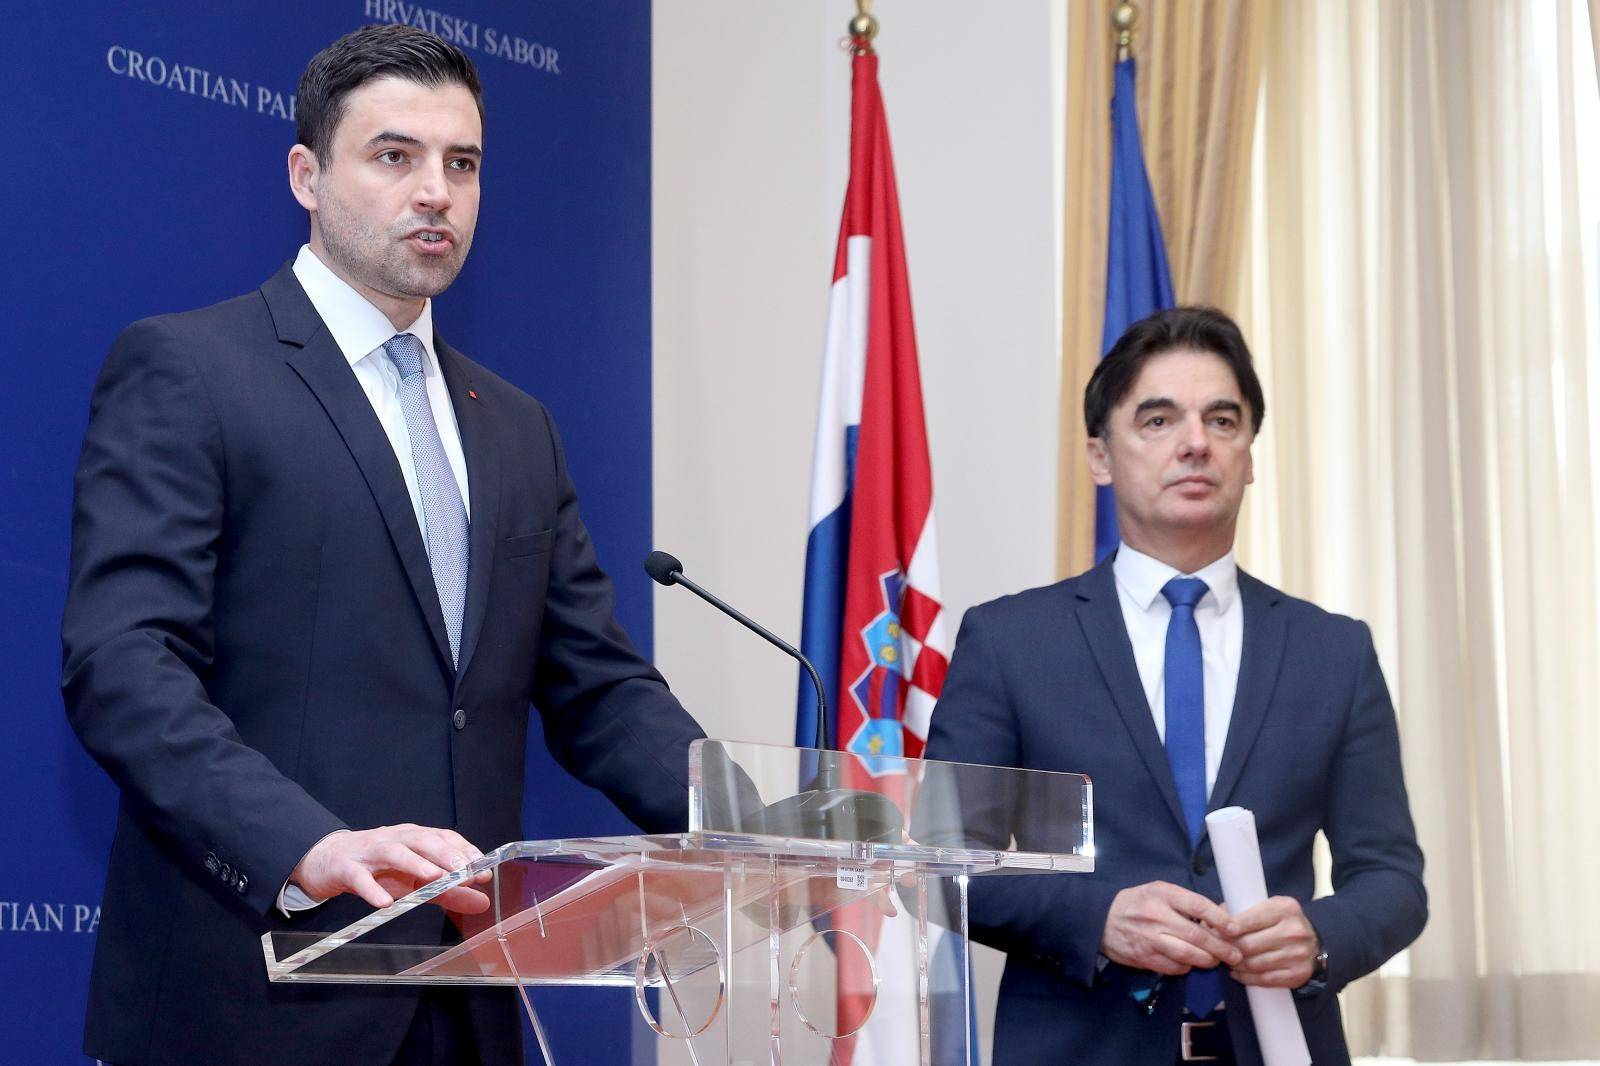 Zagreb: Klub zastupnika SDP-a o smanjenju PDV-a za turizam